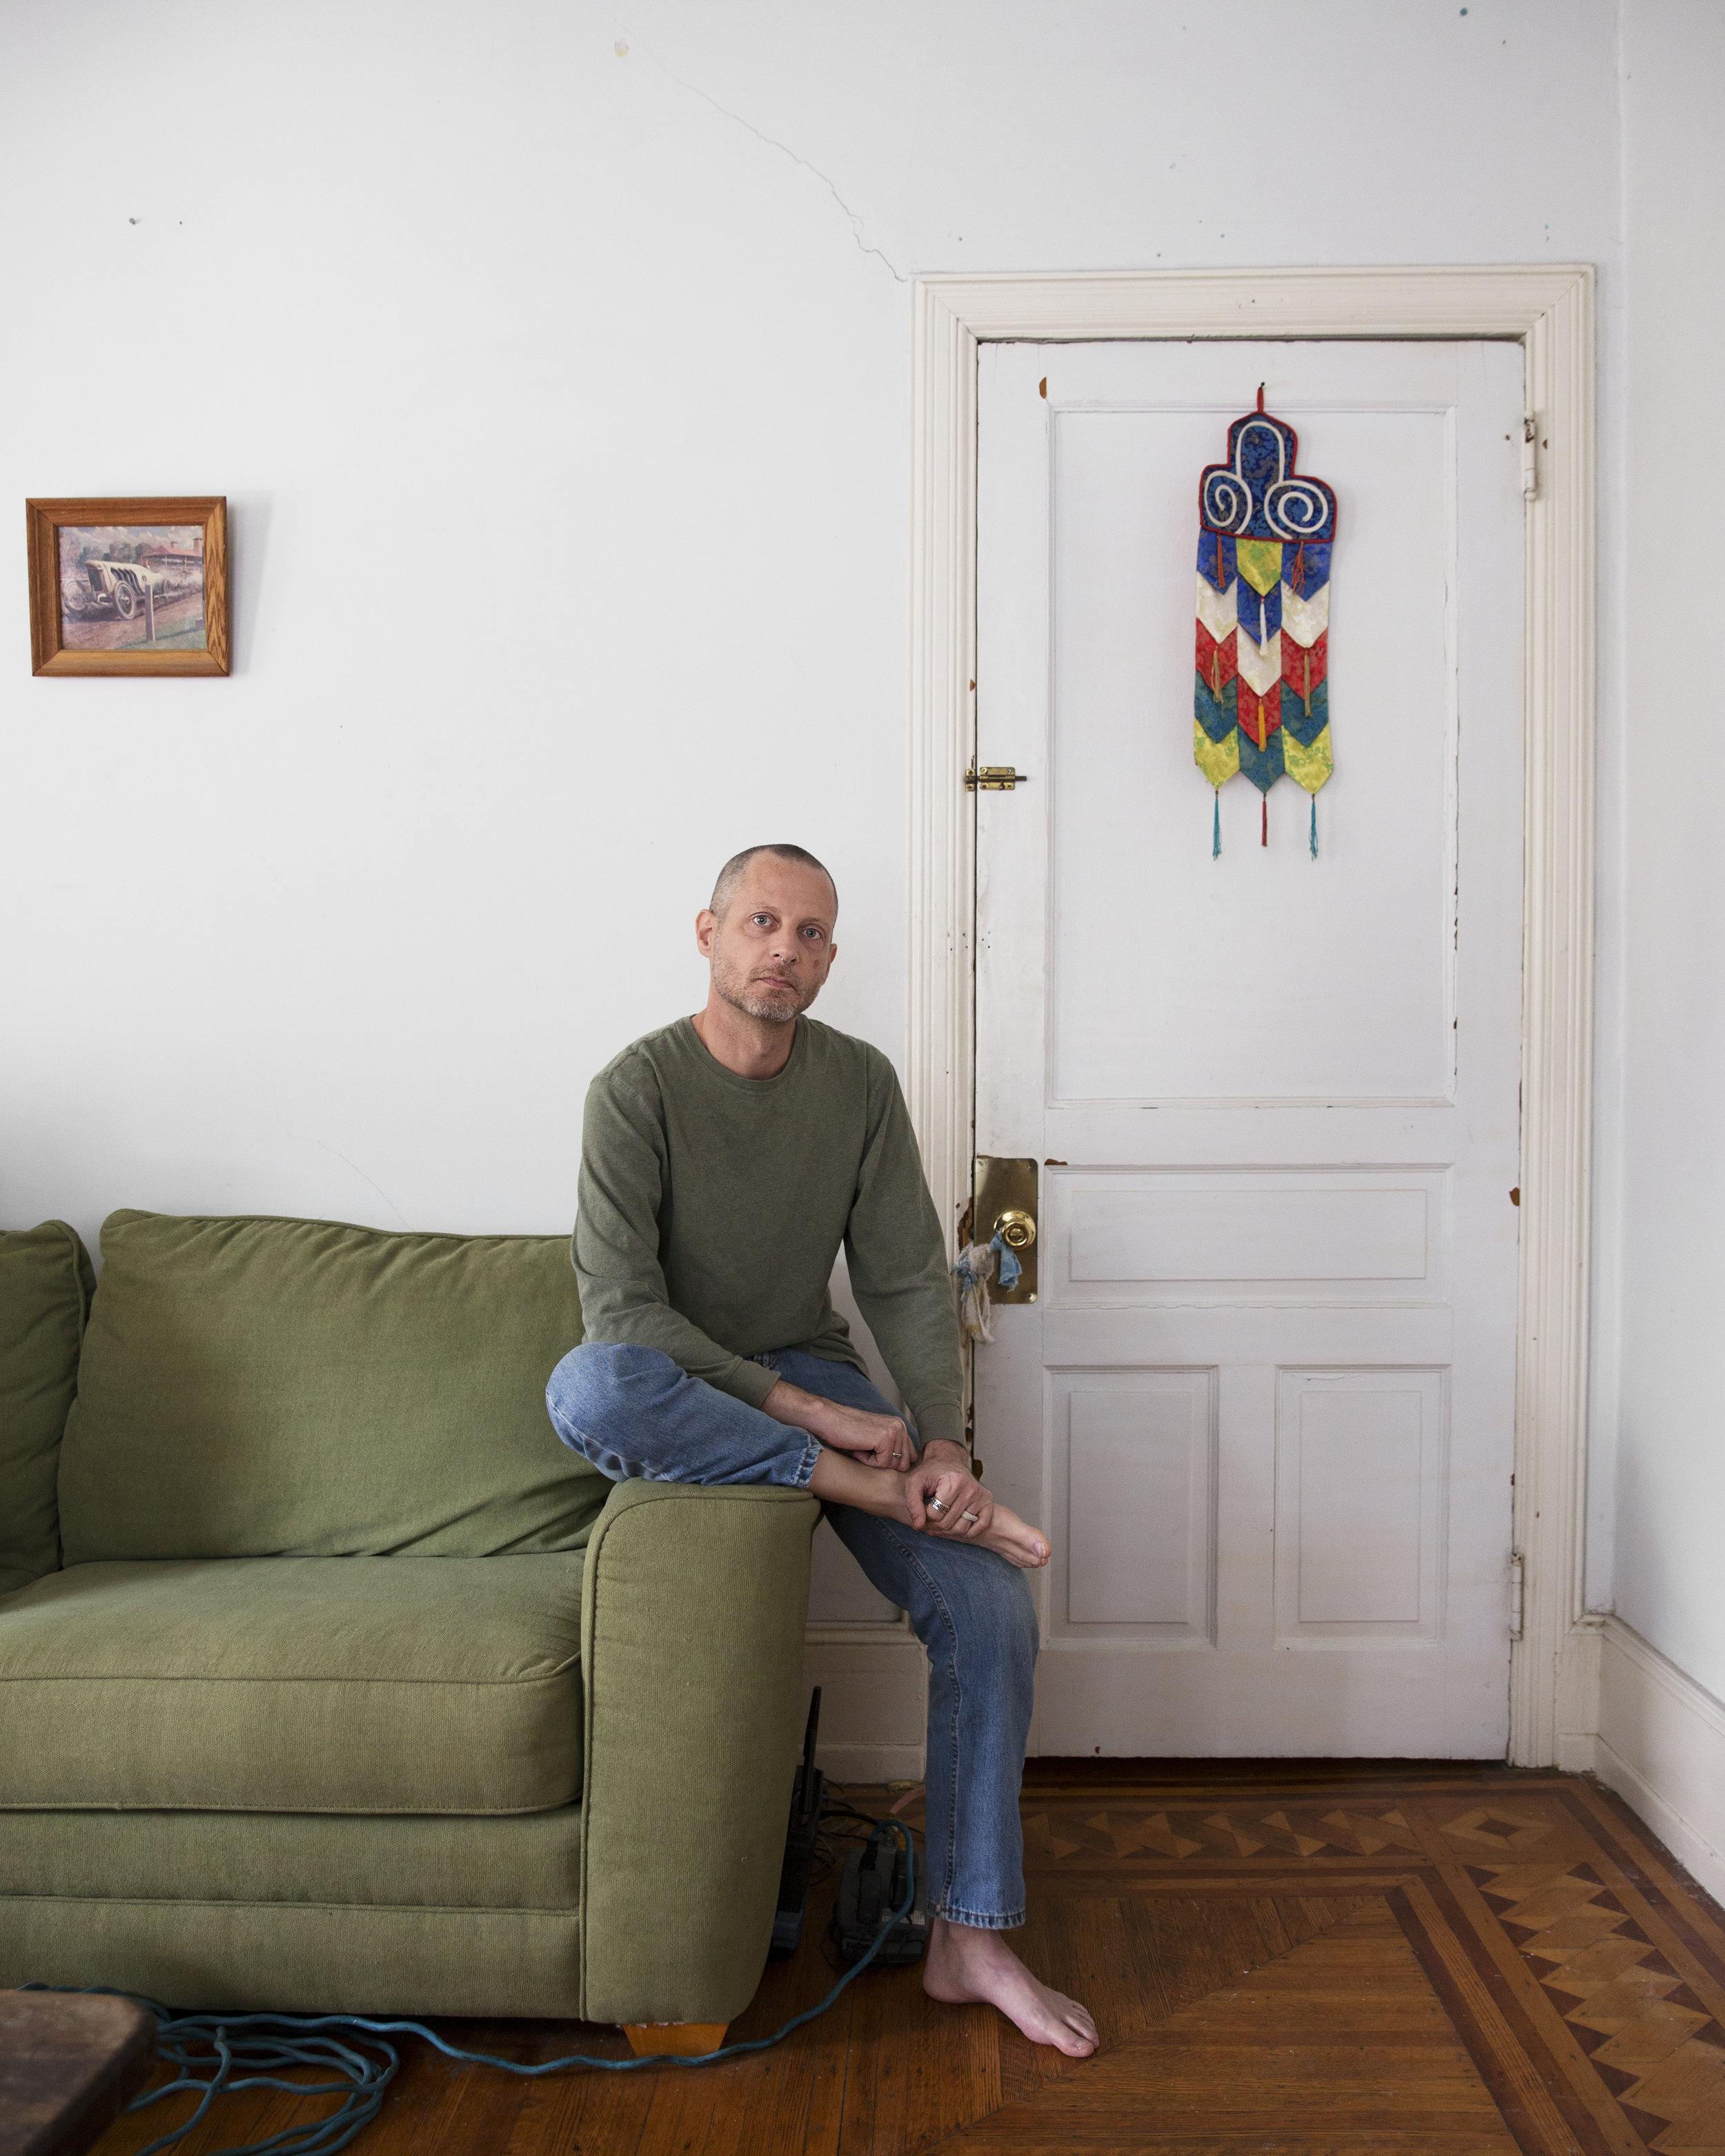 Rico, 51. Social worker. 28 year survivor of HIV.